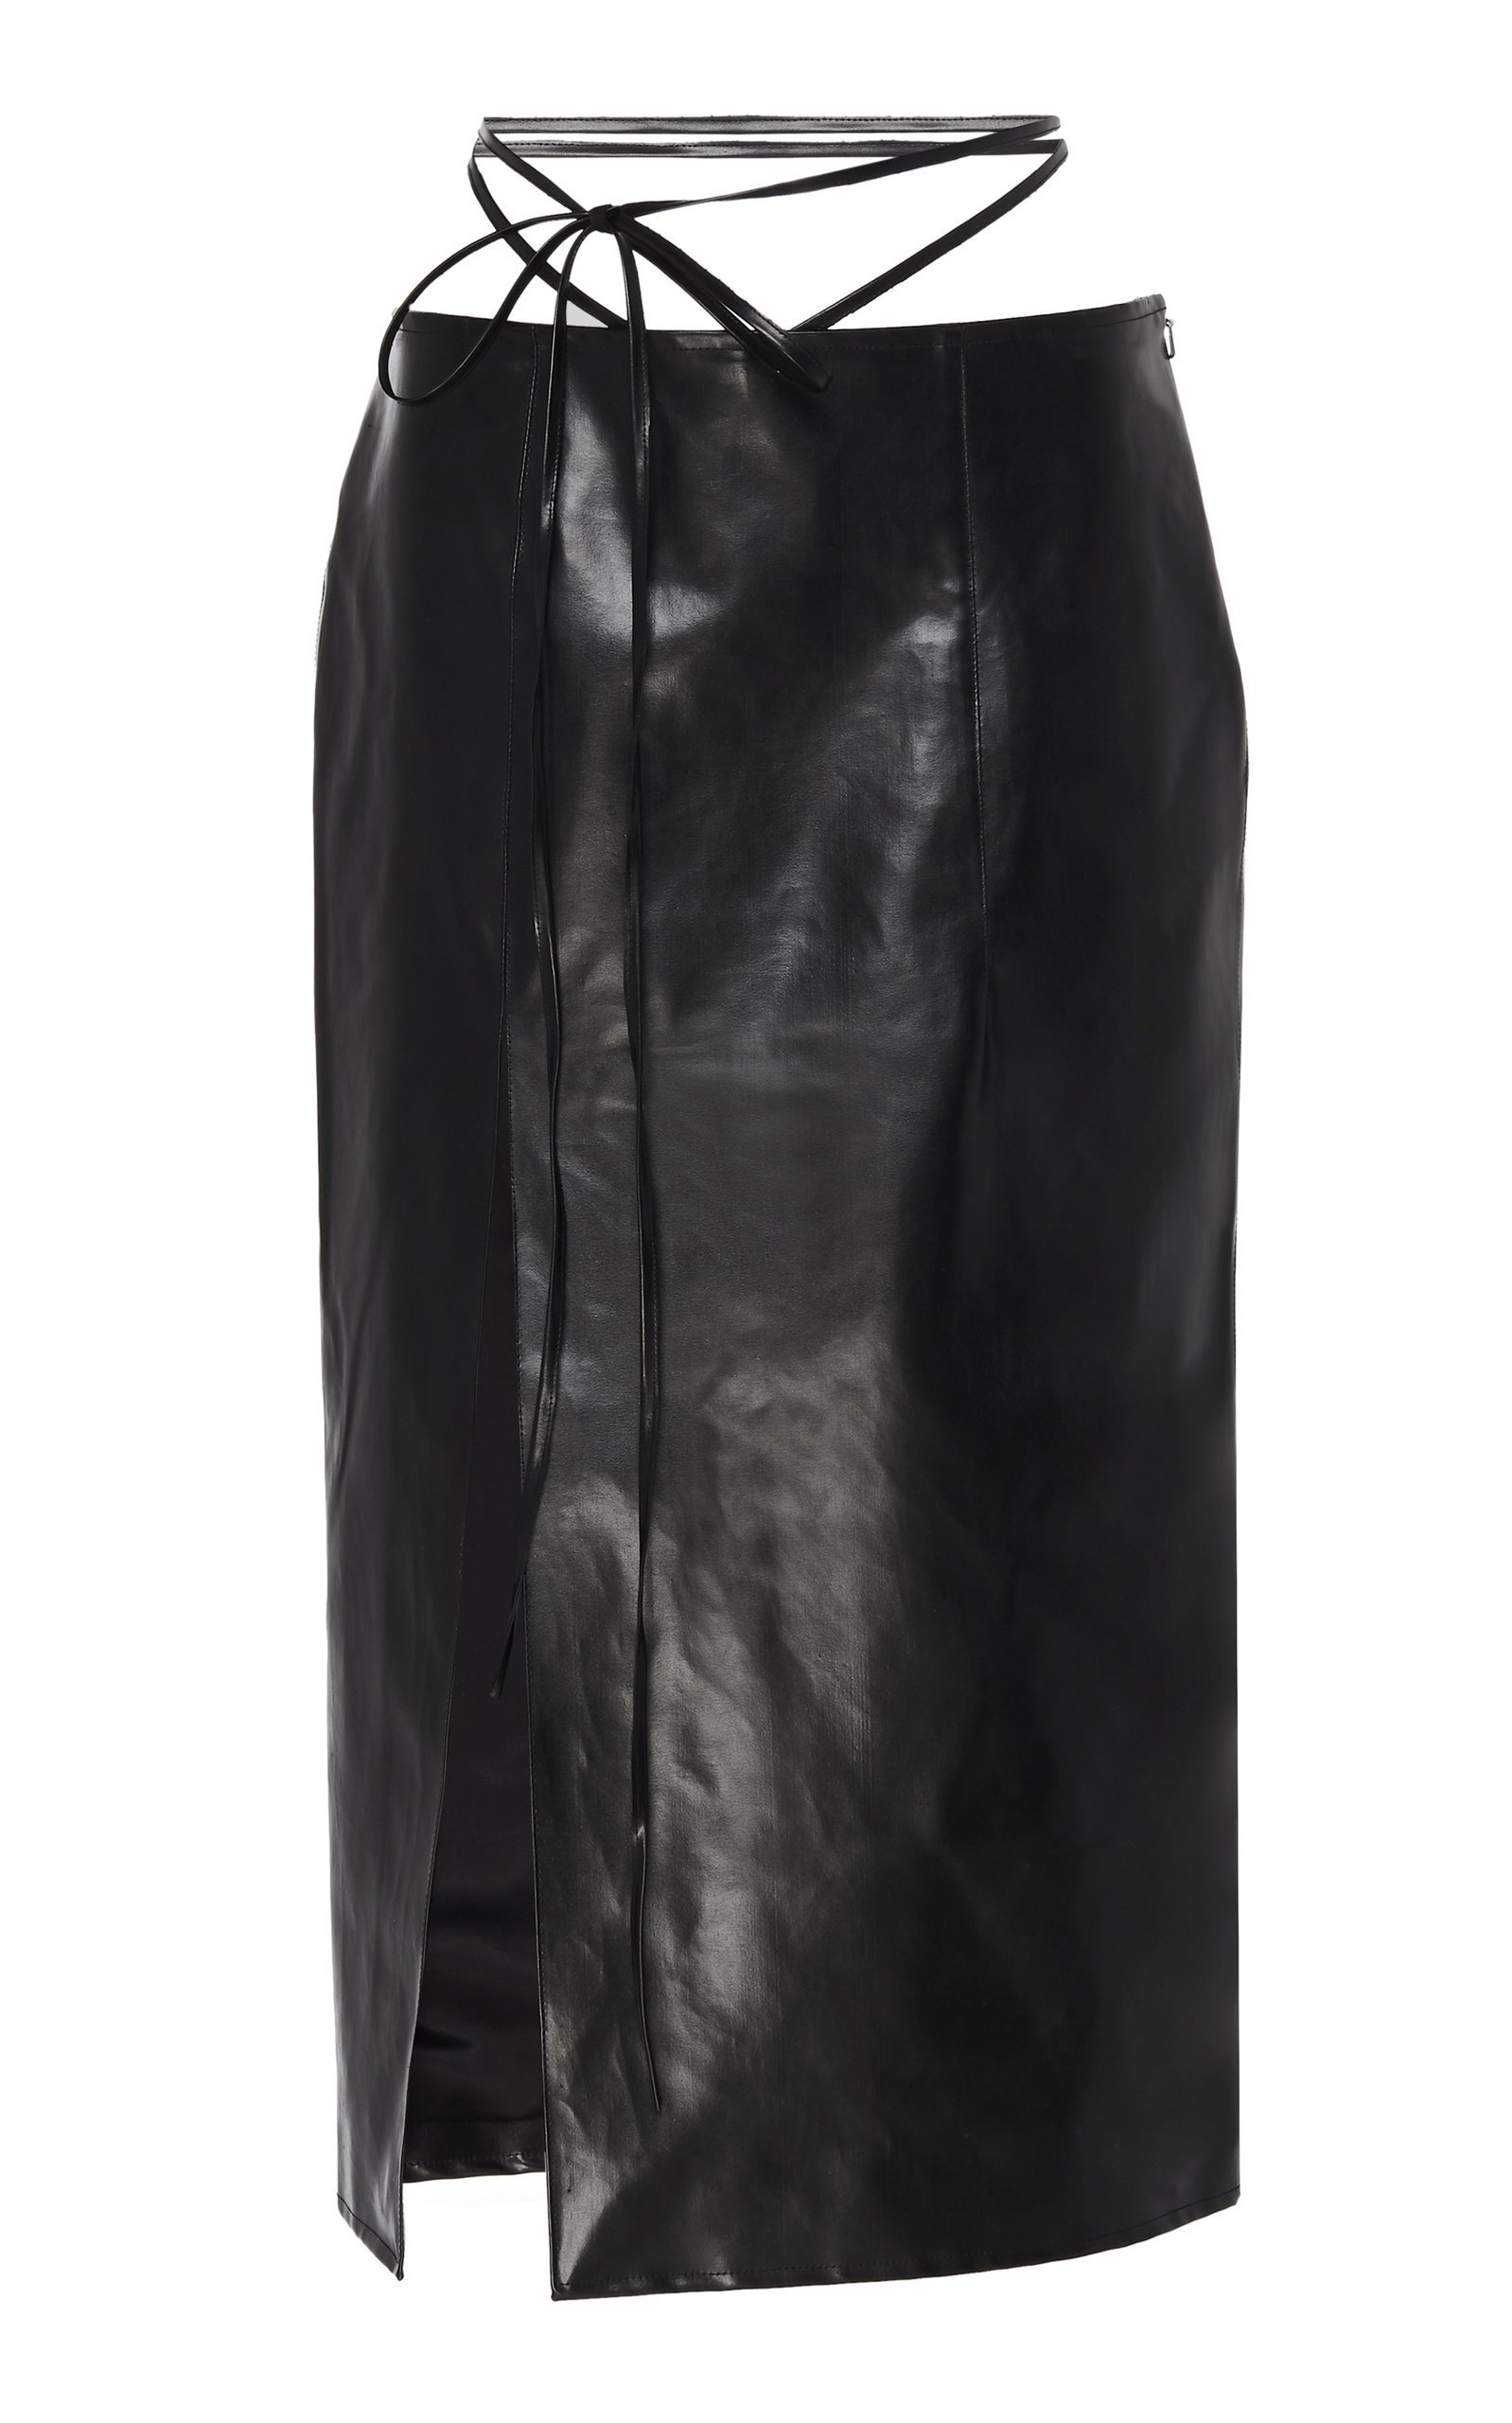 Supriya Lele Vinyl Pencil Skirt Size: S